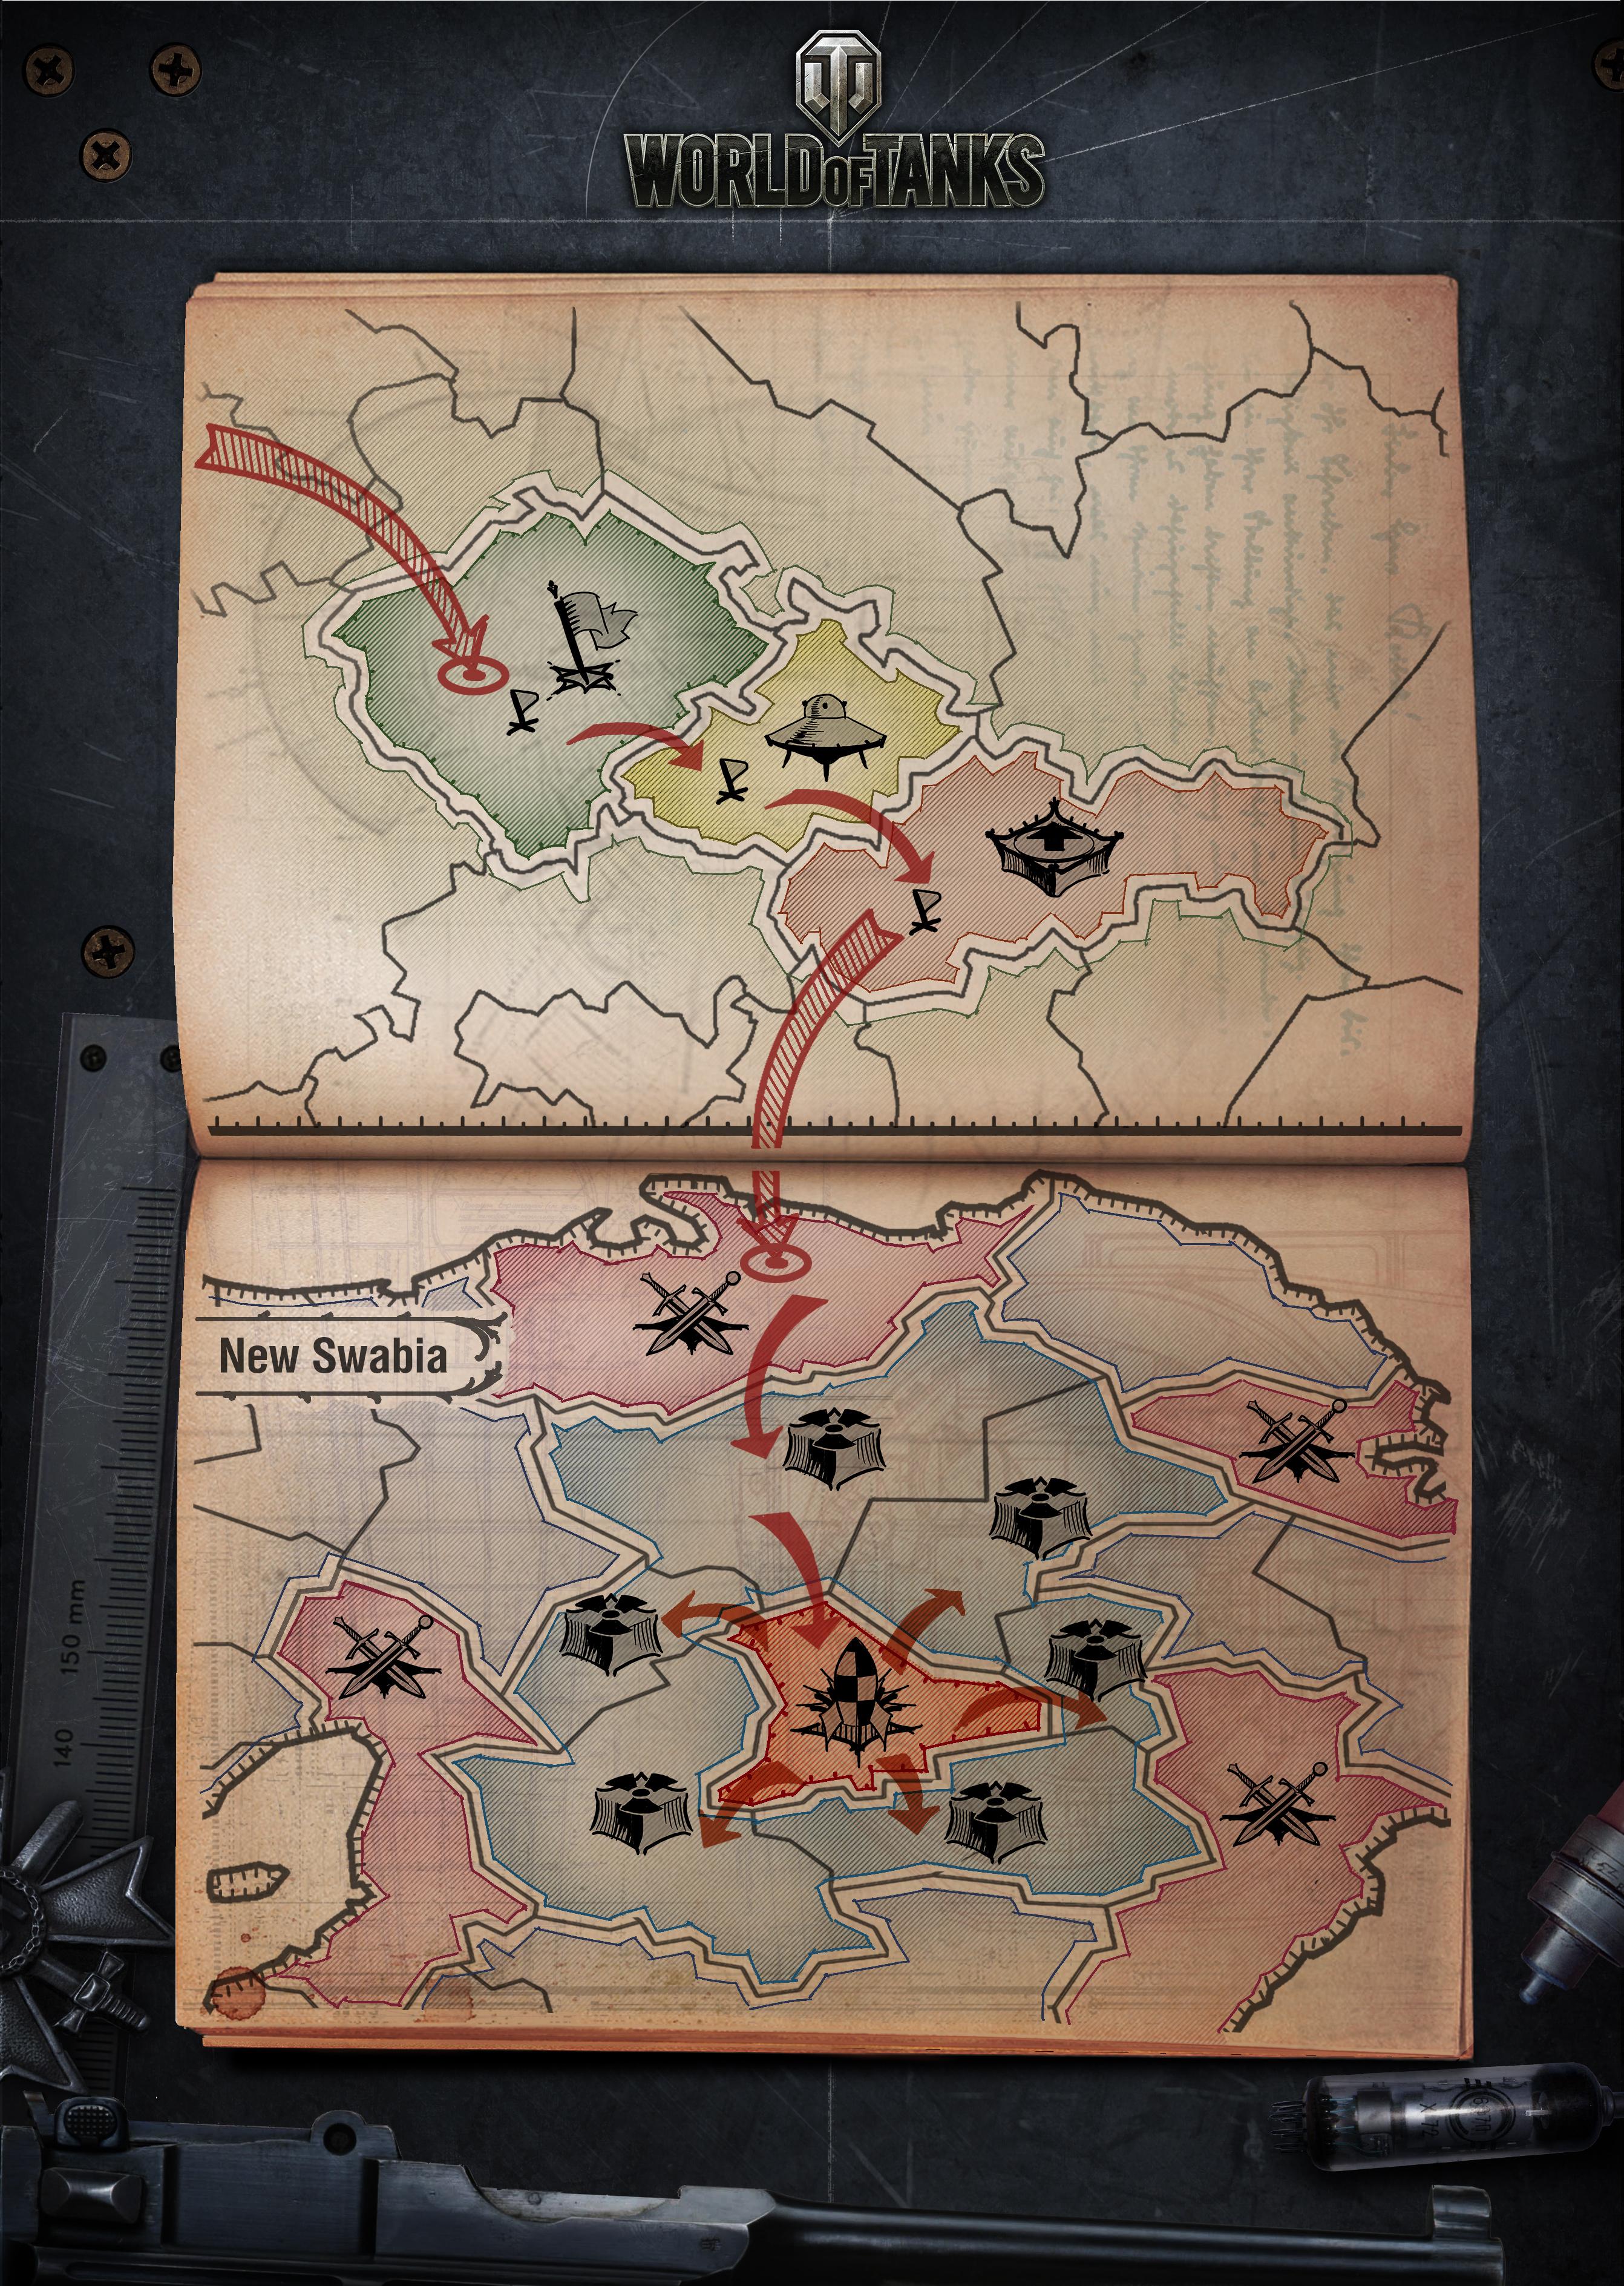 wot_infographic_armaggeddonmap_phil.jpg